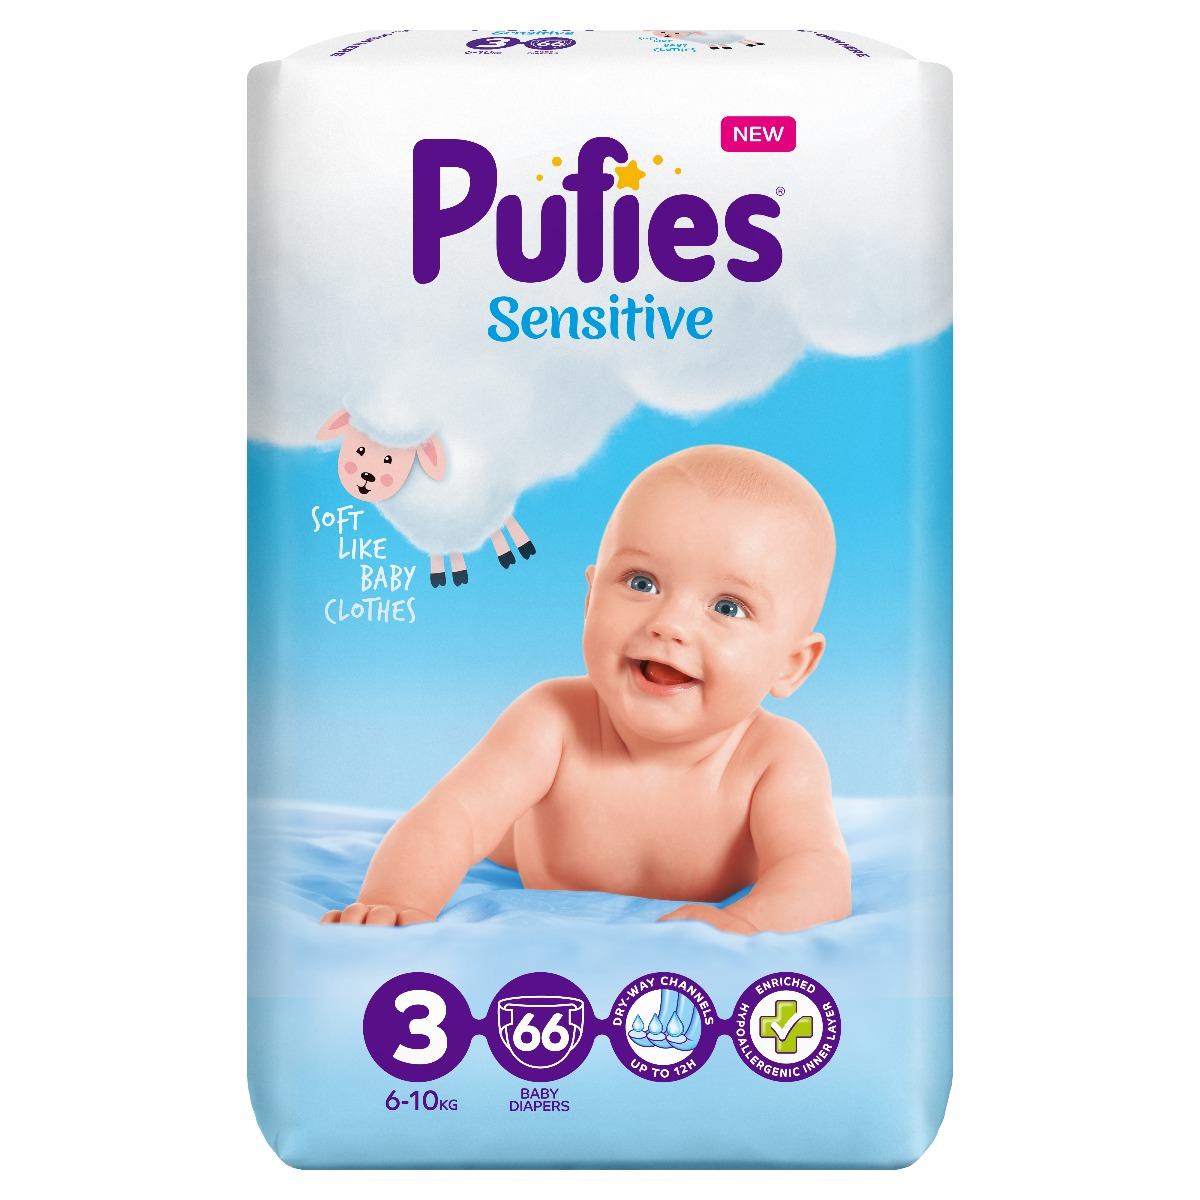 Scutece Pufies Sensitive Nr 3, 6 - 10 Kg, 66 buc imagine 2021